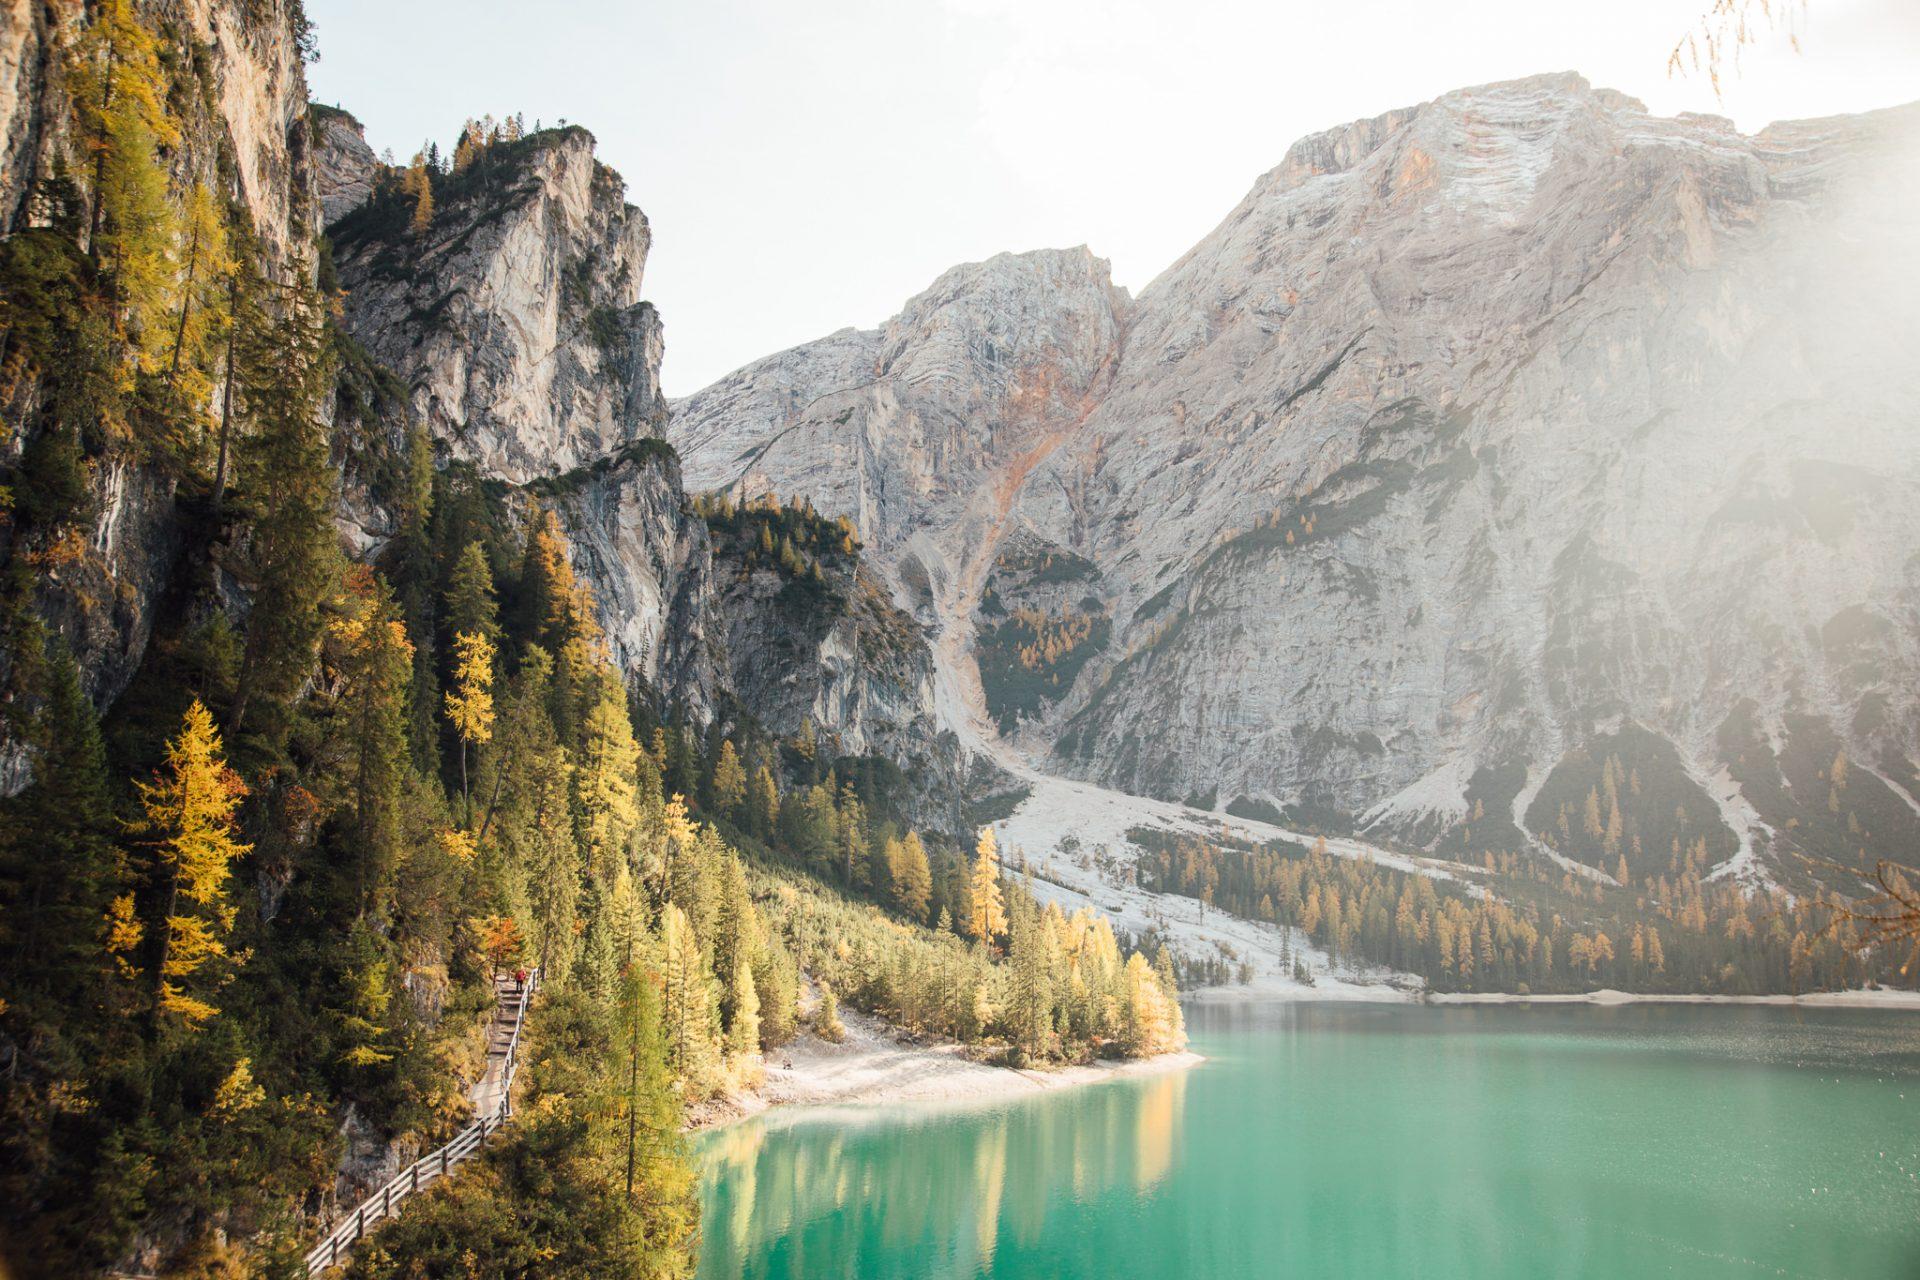 lago-di-braies-dolomity-jeziora